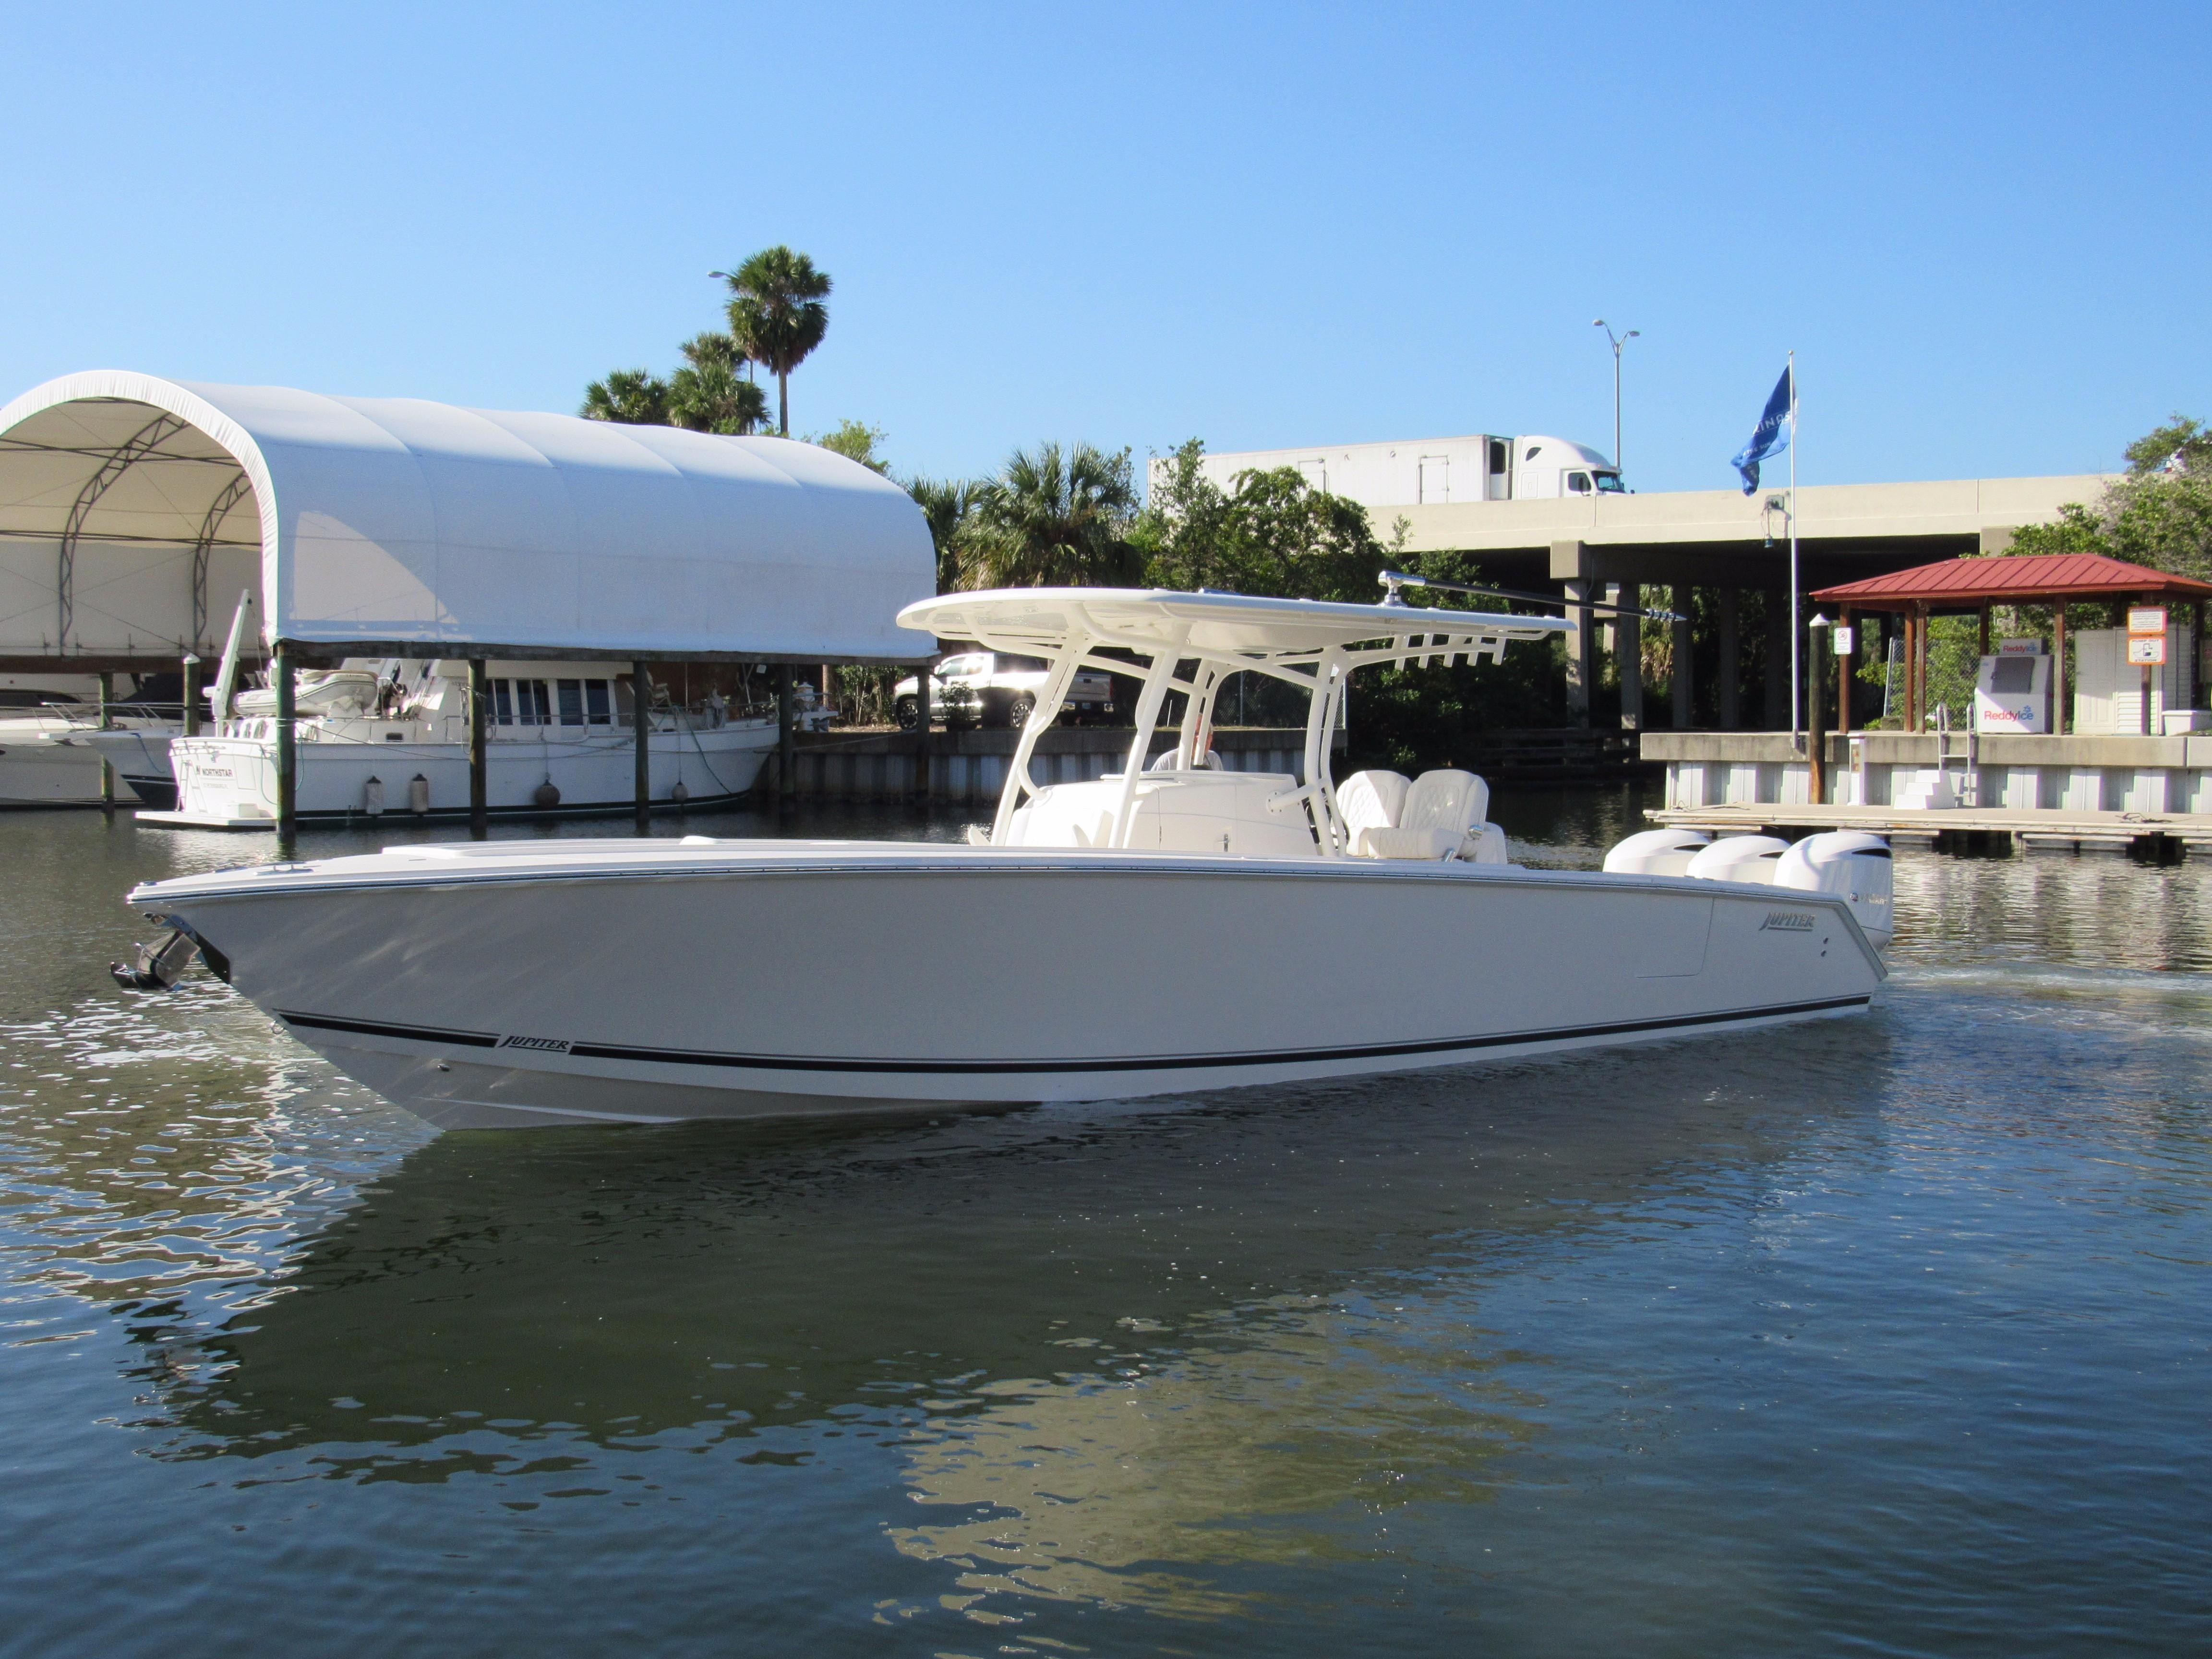 2019 Jupiter 34 HFS Power Boat For Sale - www.yachtworld.com